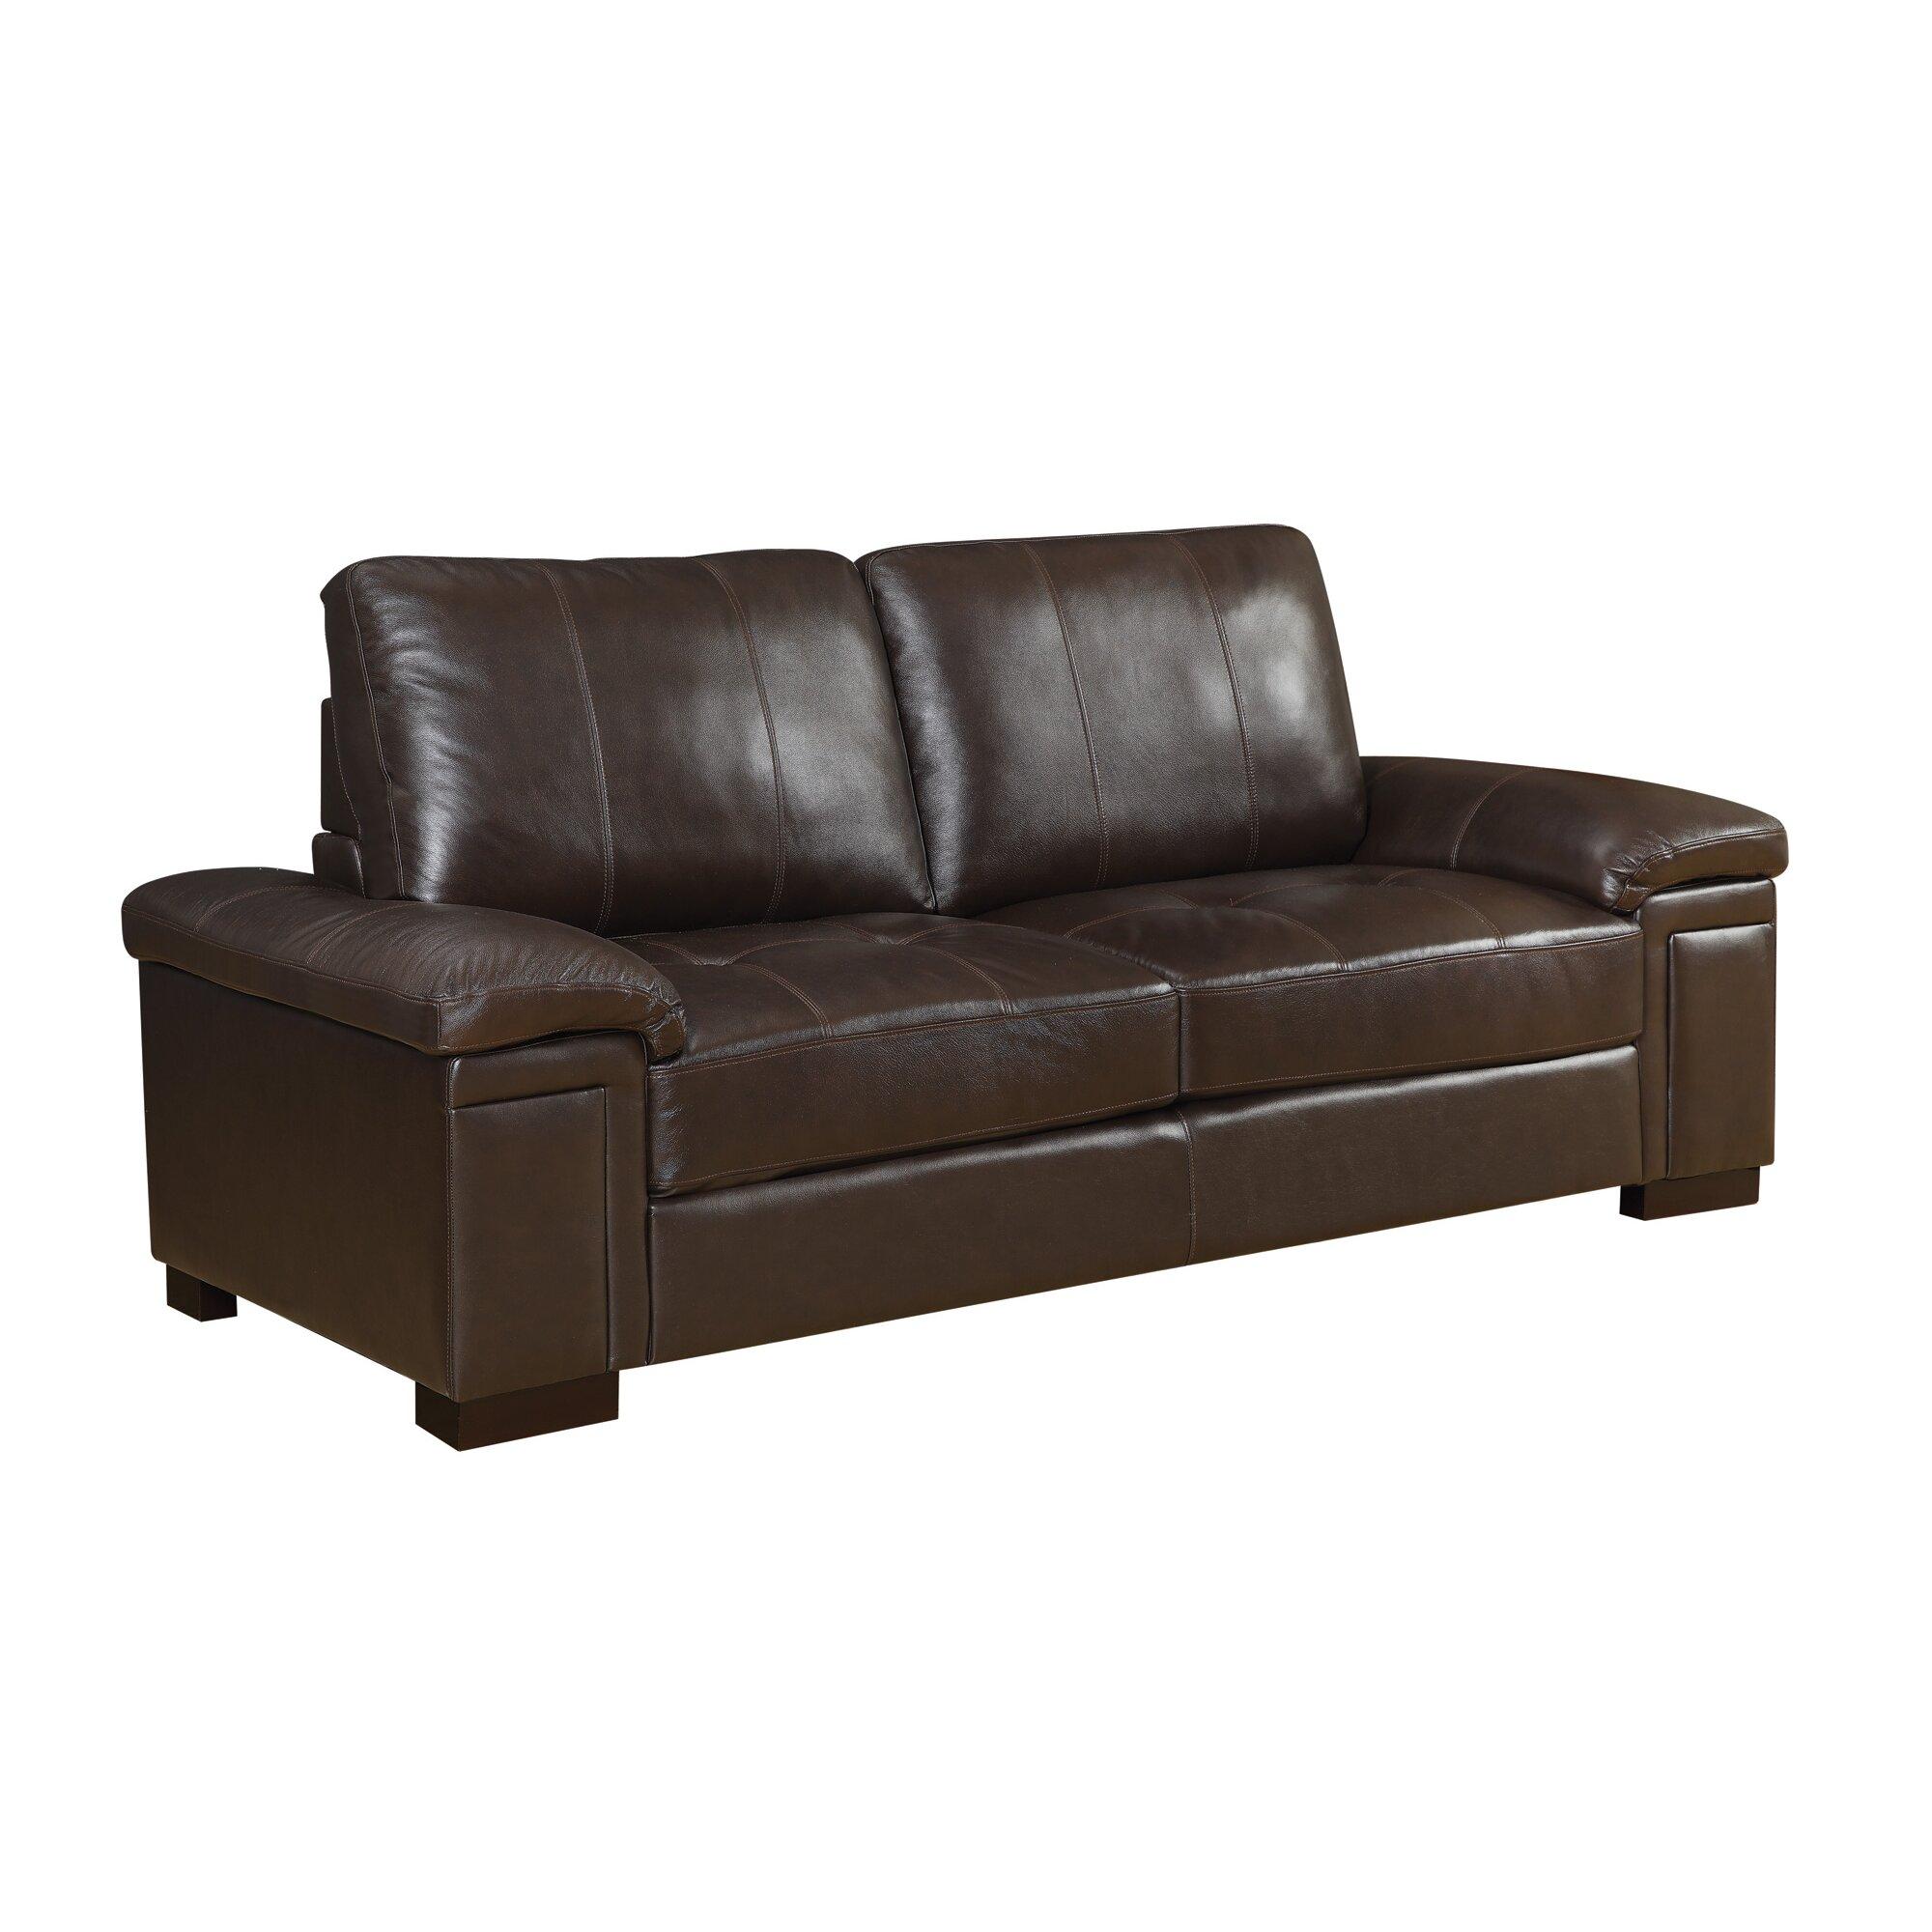 Wildon home r leather sofa reviews wayfair for Leather sectional sofa wayfair